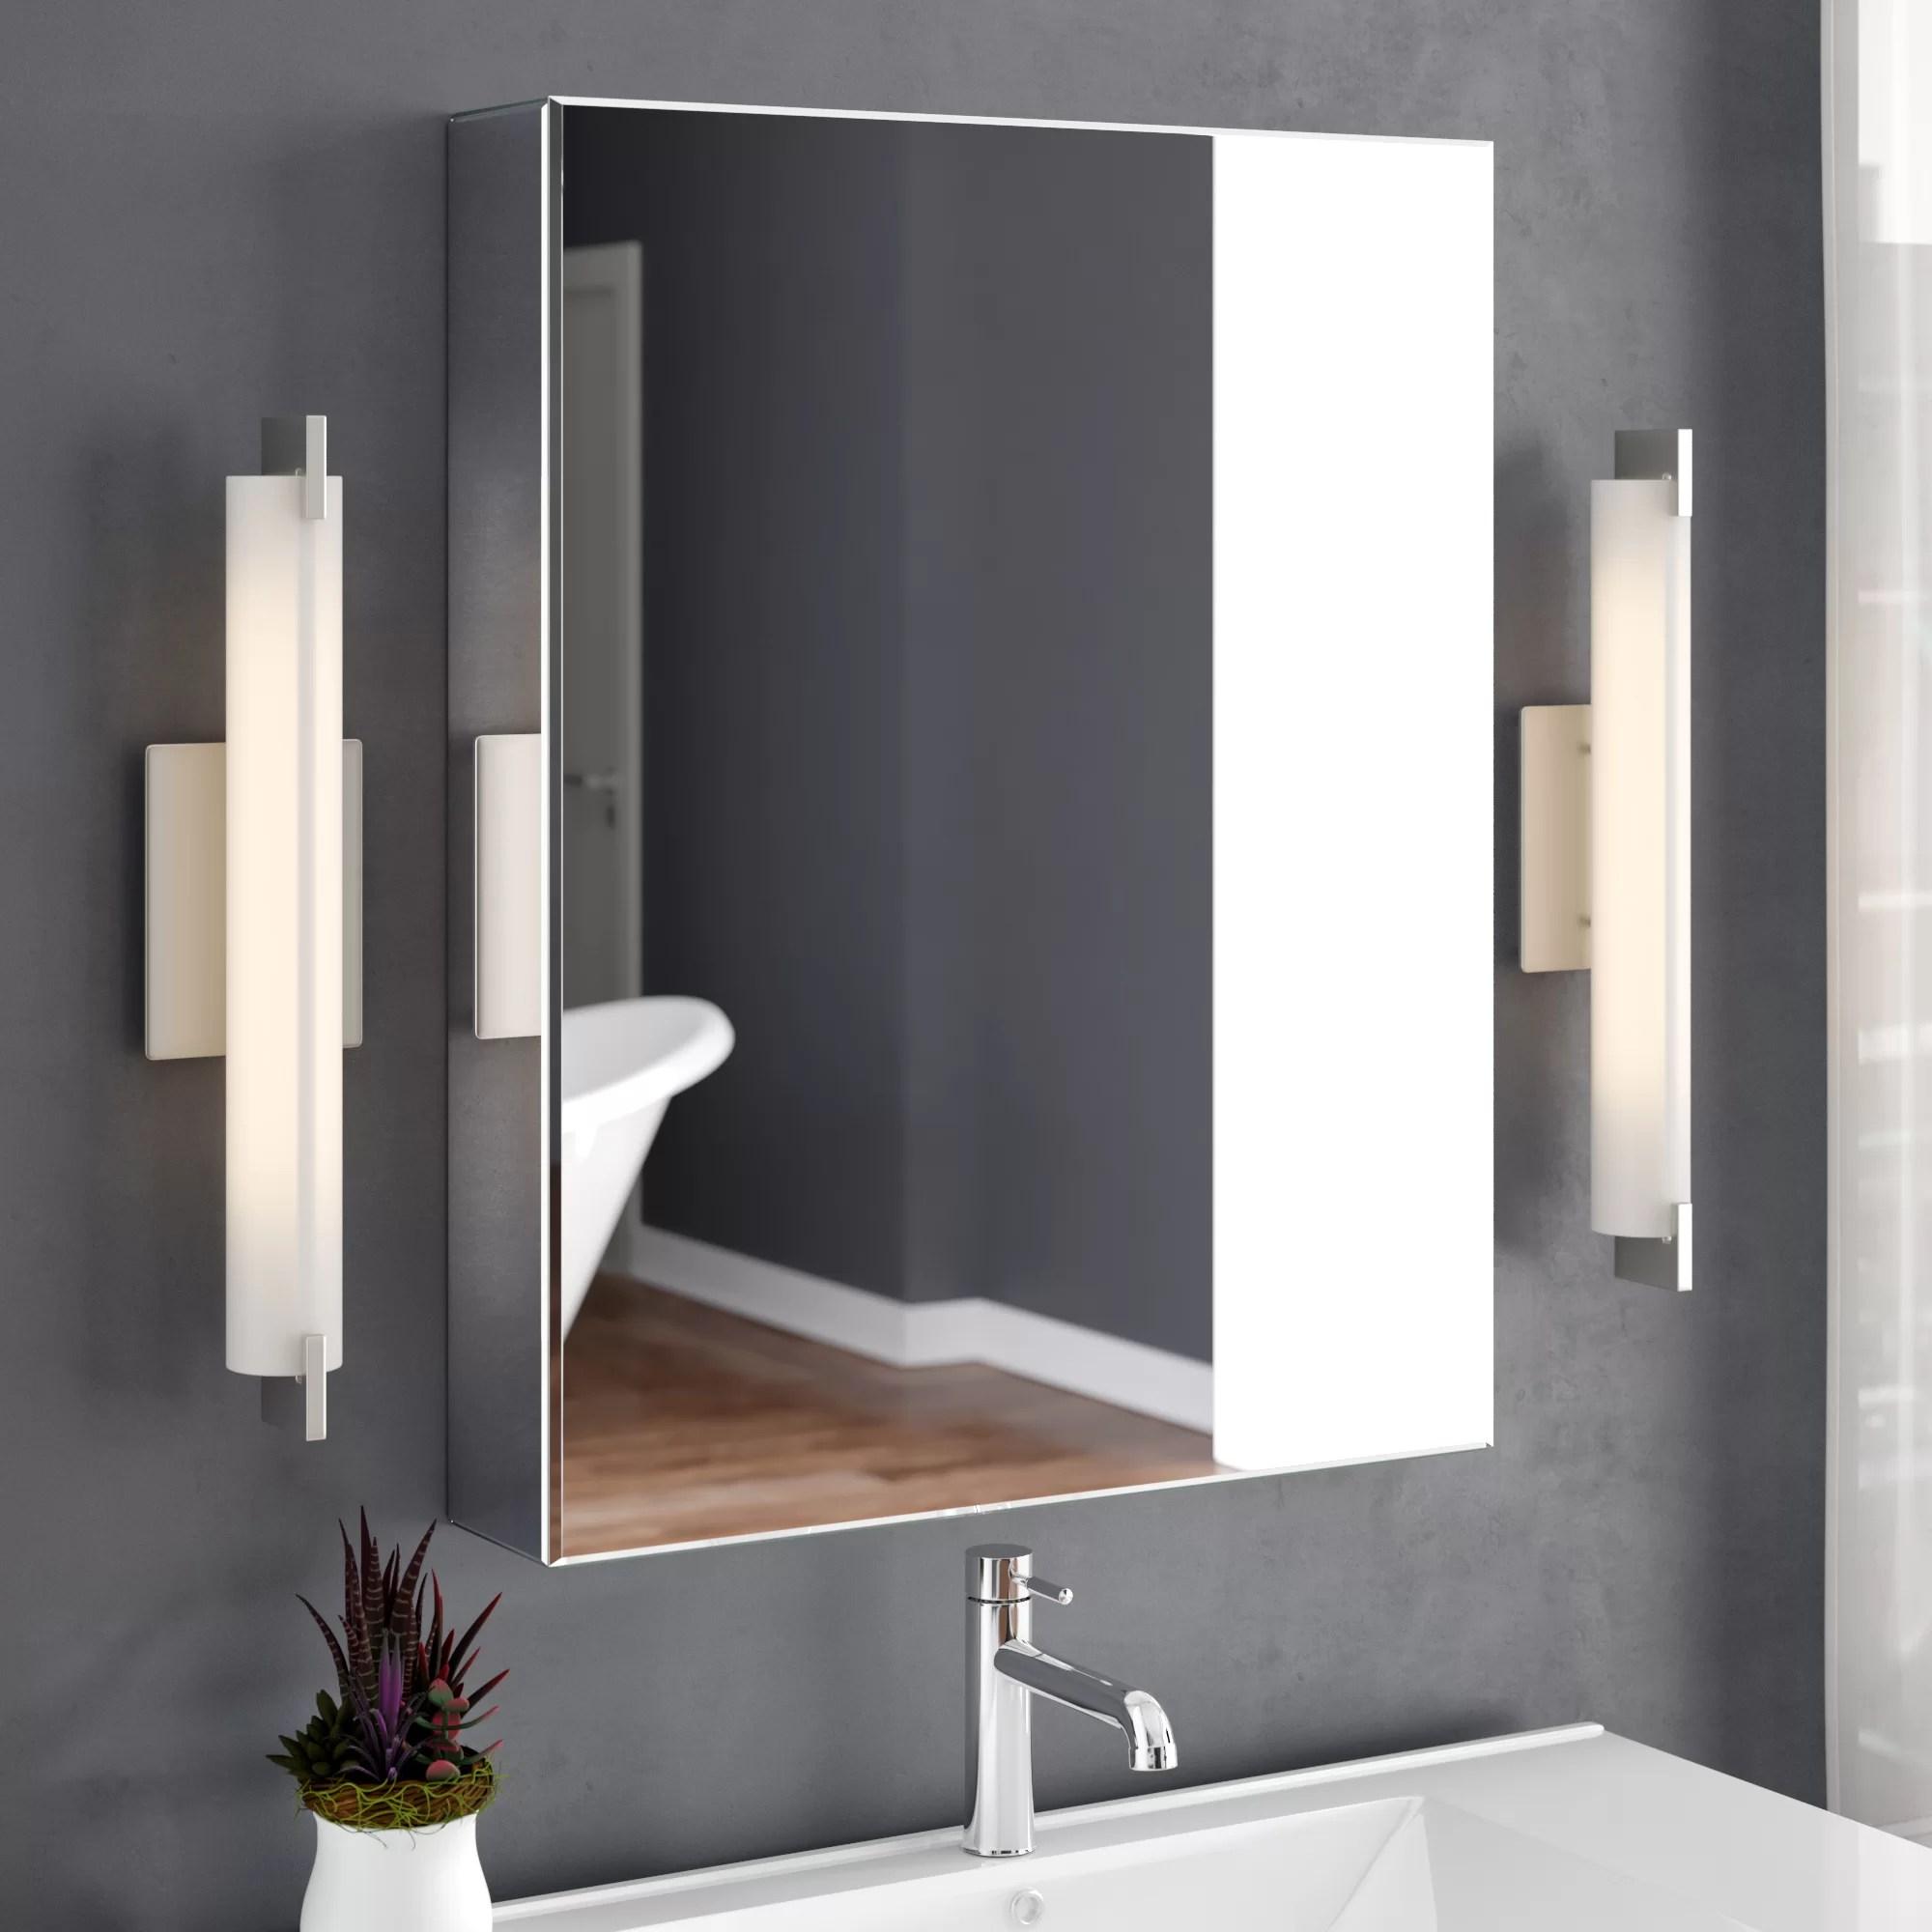 Ebern Designs Aultman 24 X 30 Recessed Or Surface Mount Frameless Medicine Cabinet With 3 Adjustable Shelves Reviews Wayfair